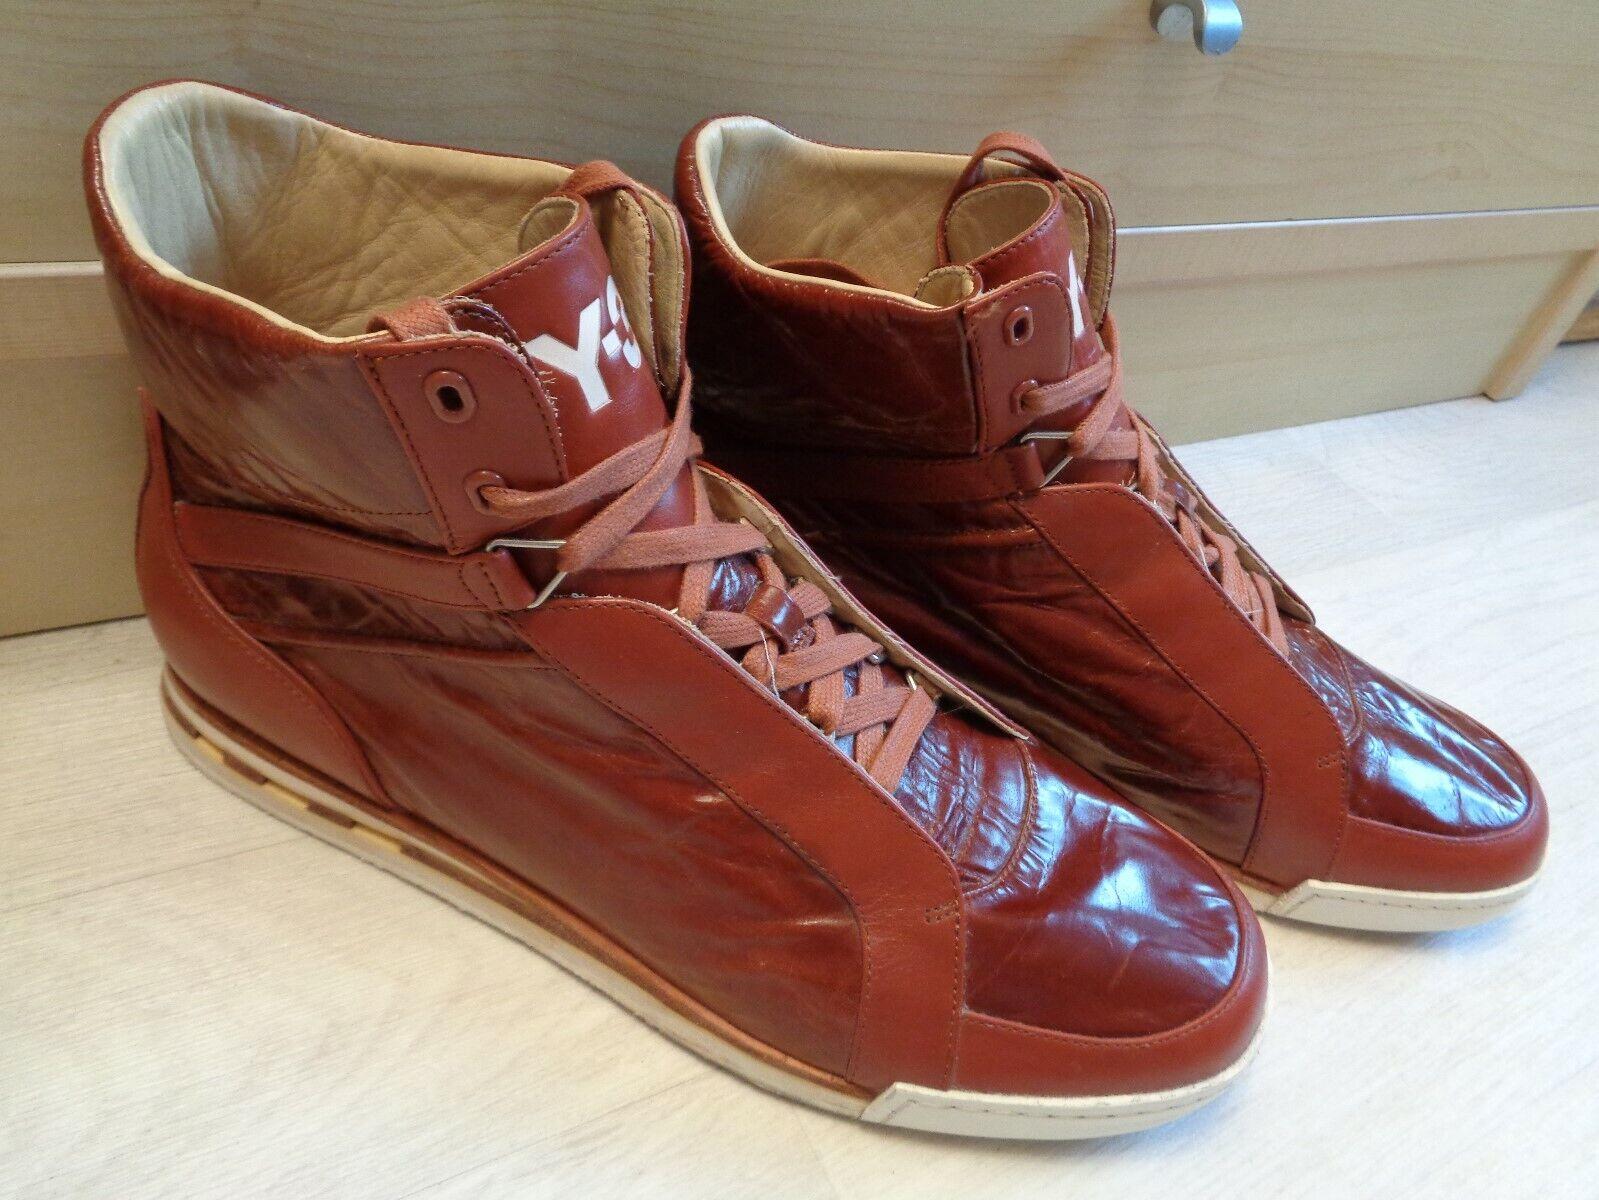 Y-3 Yohji Yamamoto ankle Stiefel UK 12 47 mens Adidas braun leather moc toe hi top